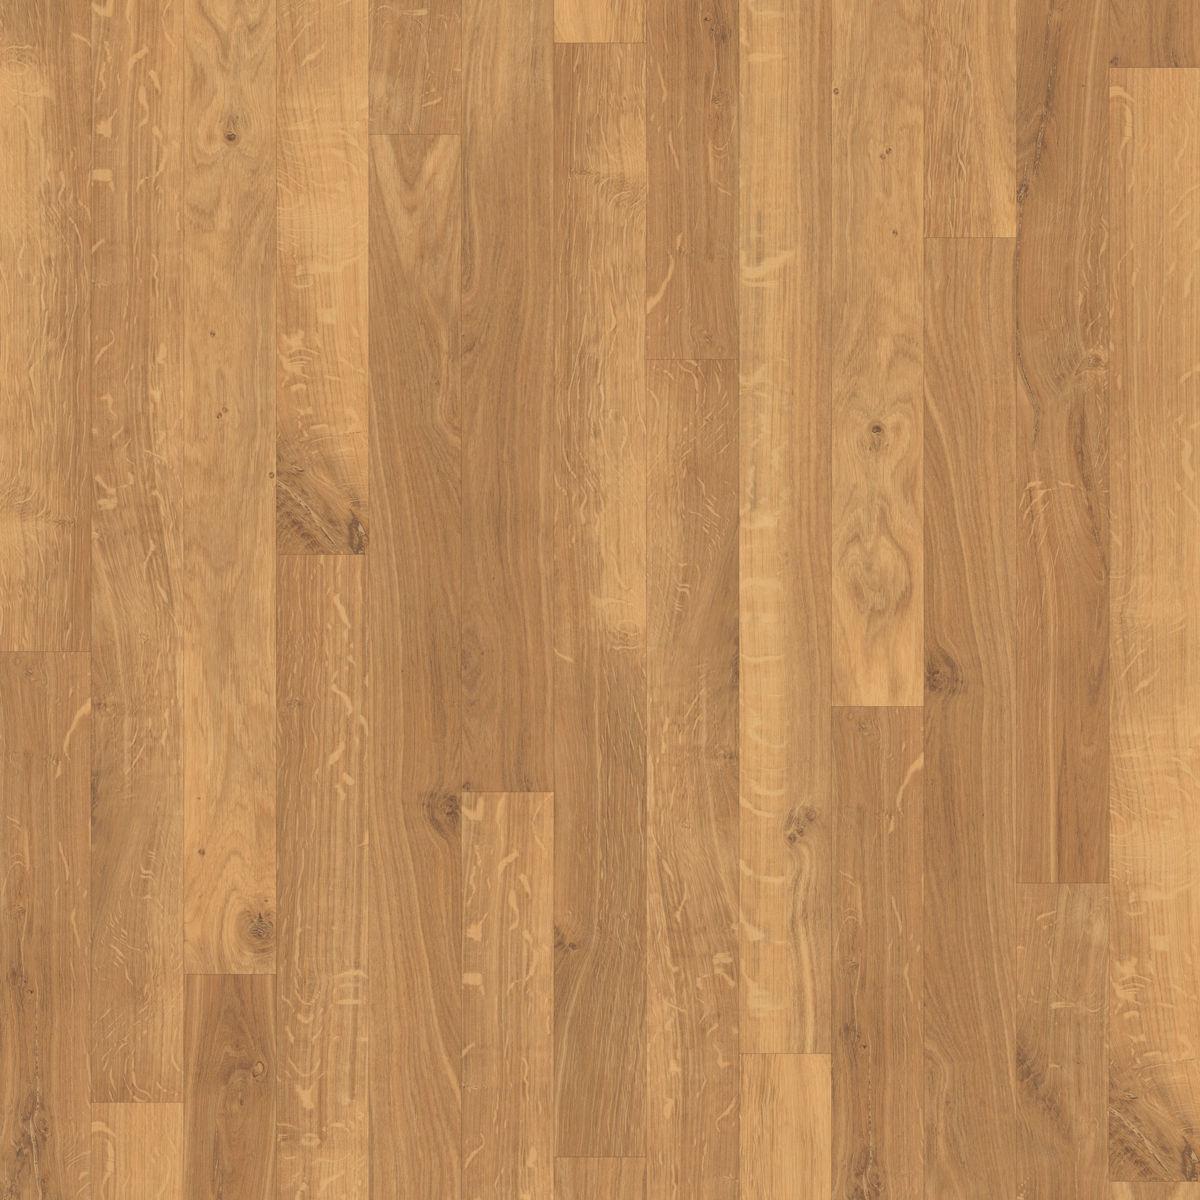 Karndean Da Vinci Fresco Light Oak Rp90 Vinyl Flooring